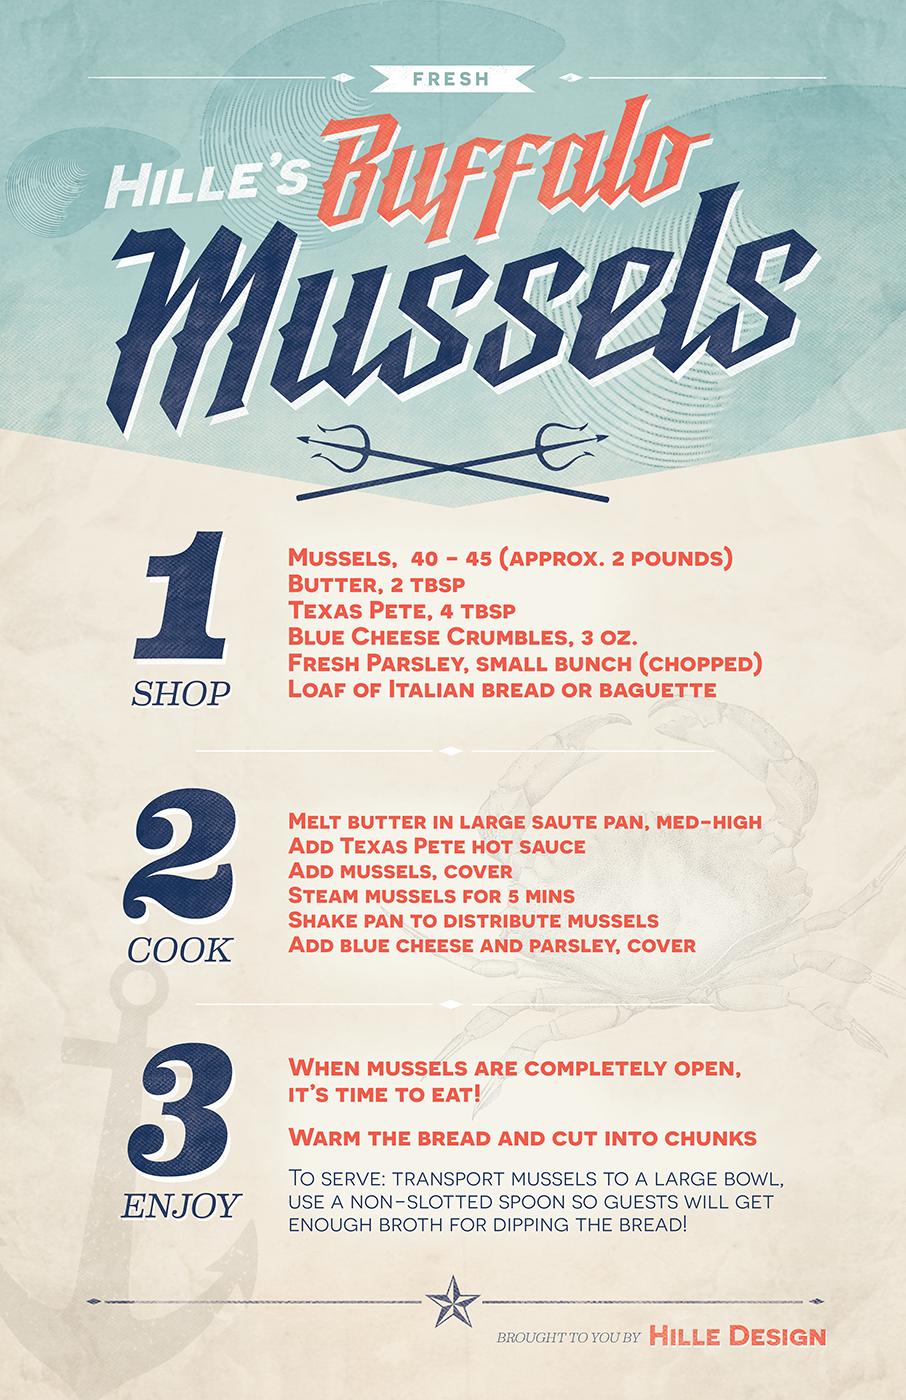 Hilles Buffalo Mussels